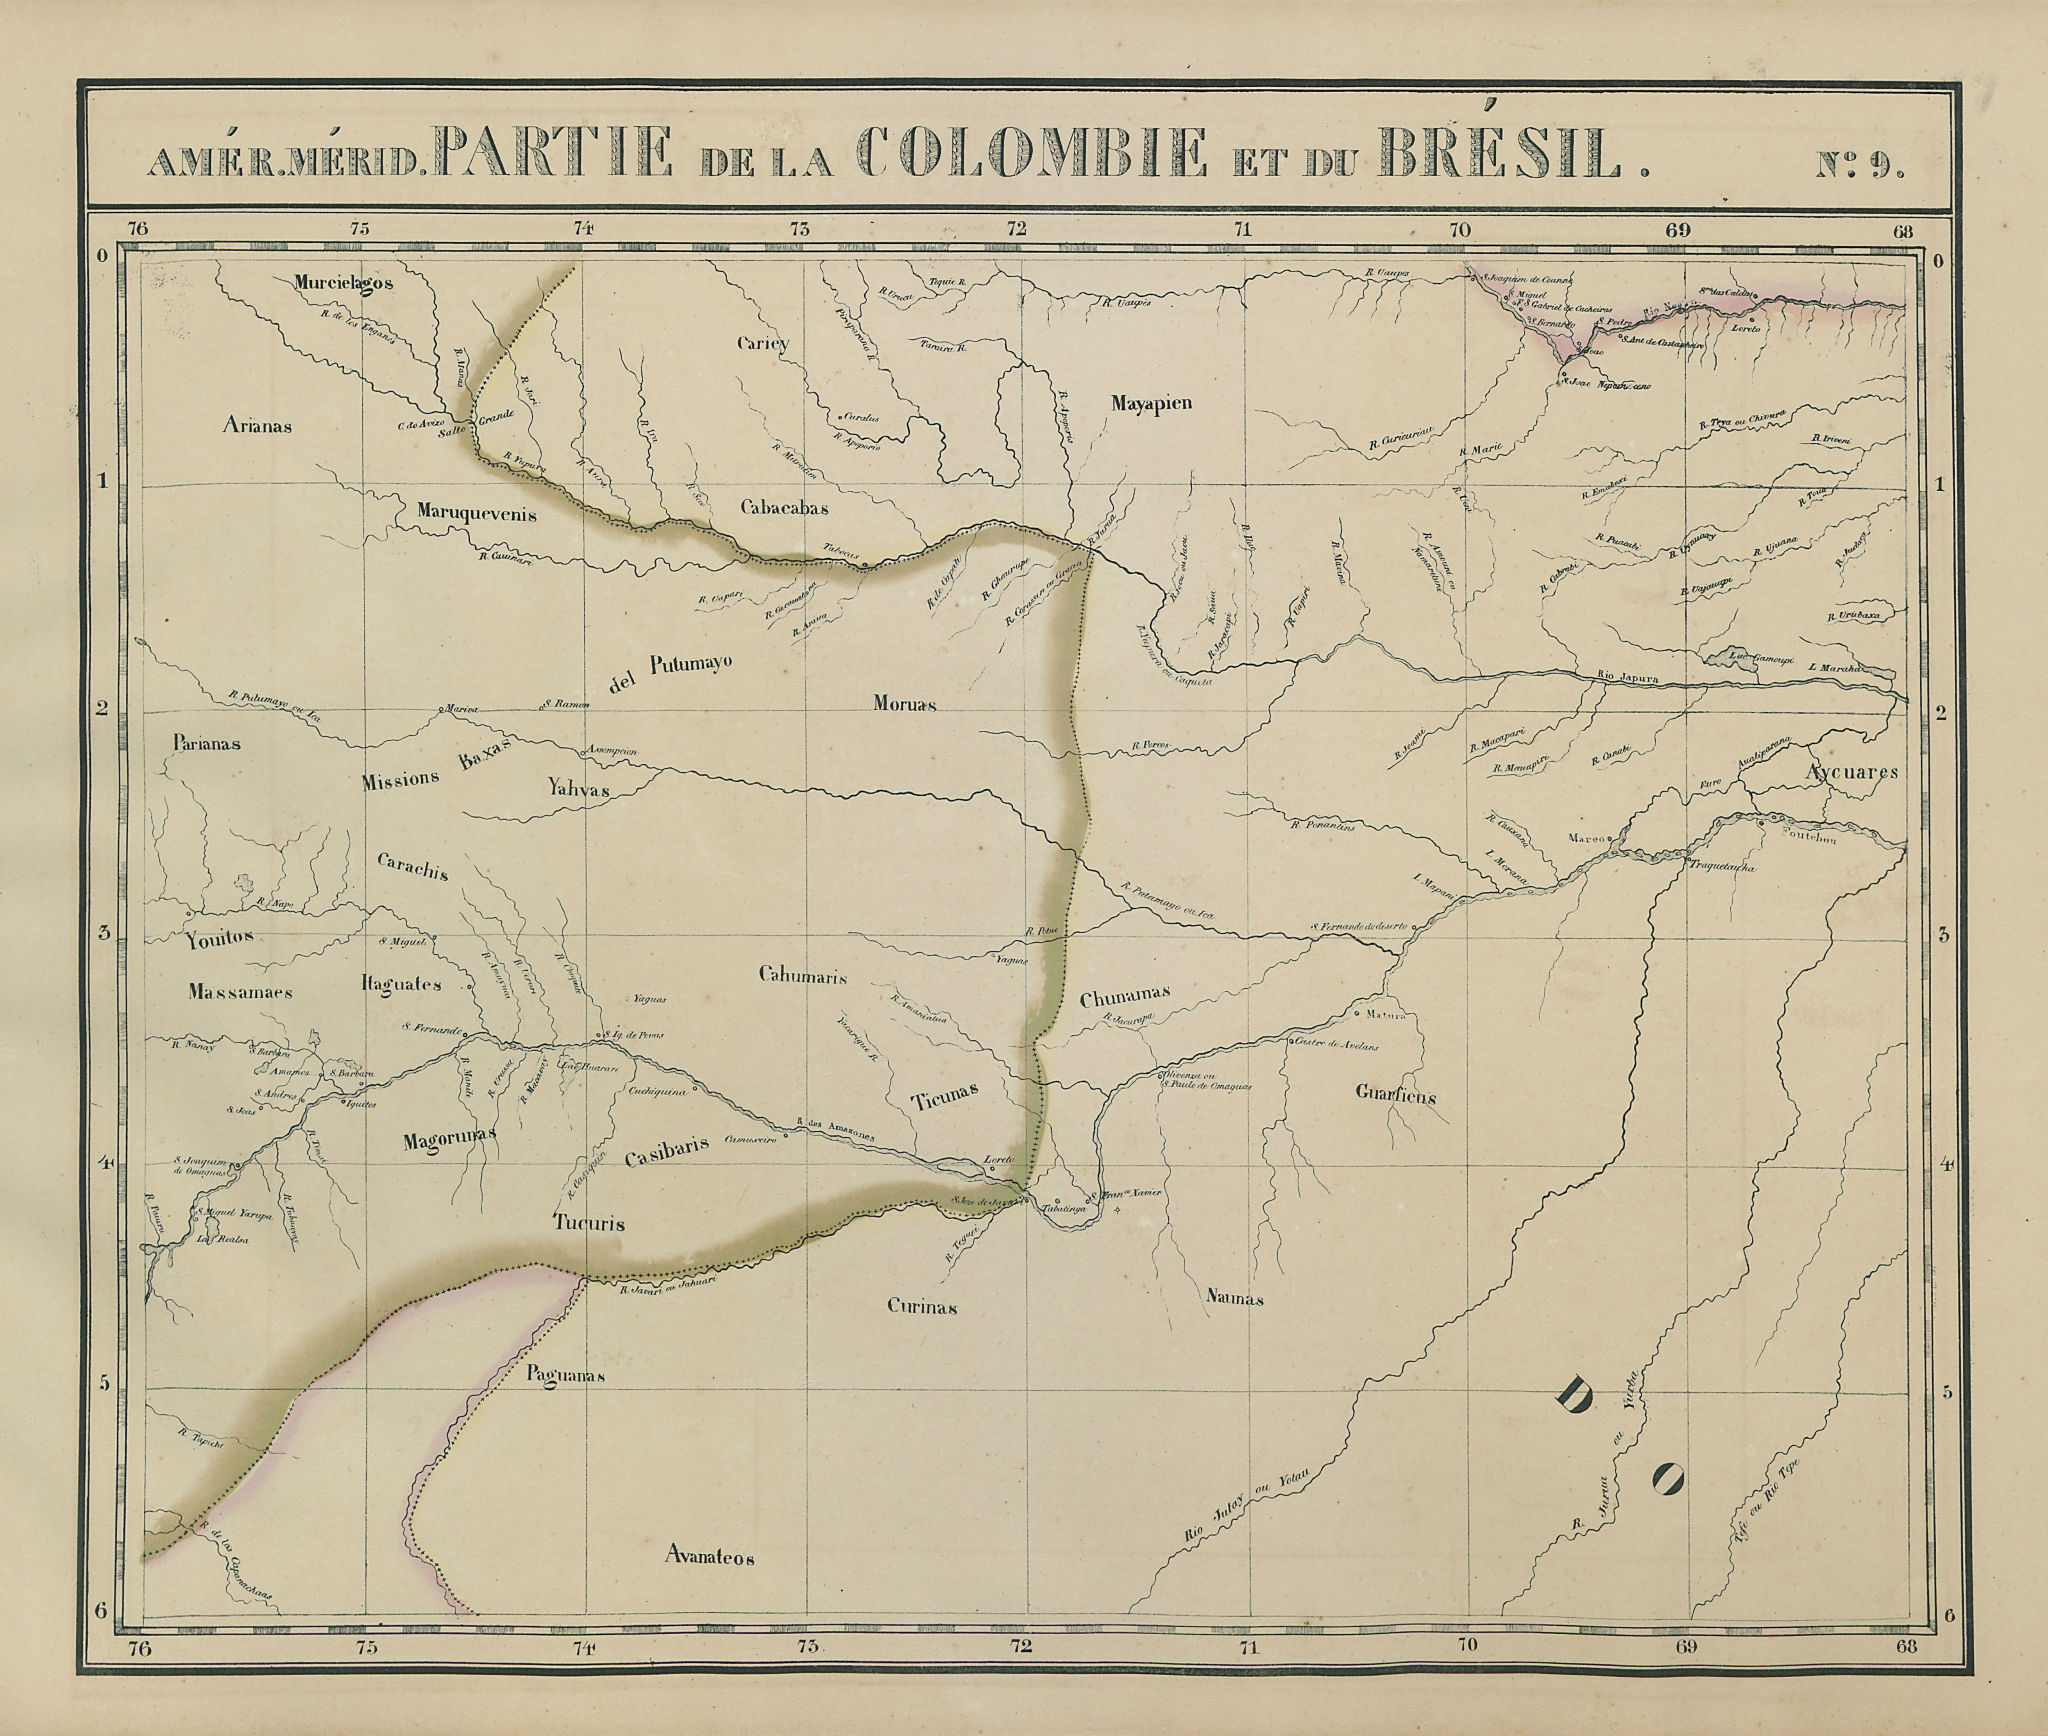 Amér Mér Colombie & Brésil 9 Peru Colombia Amazonas Brazil VANDERMAELEN 1827 map